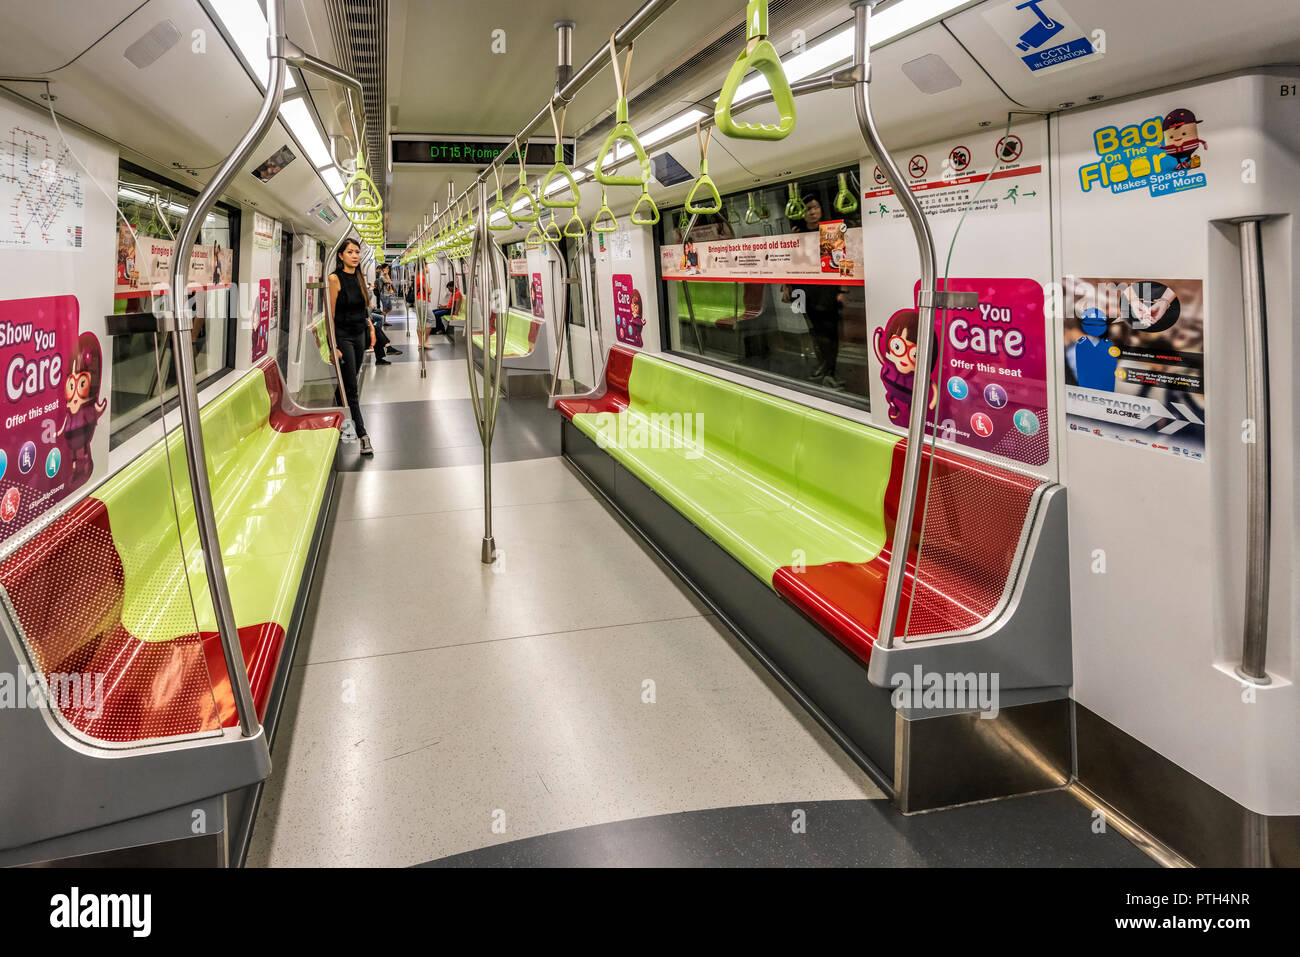 Interior view of a Singapore MRT Mass Rapid Transit Carriage, Singapore Stock Photo